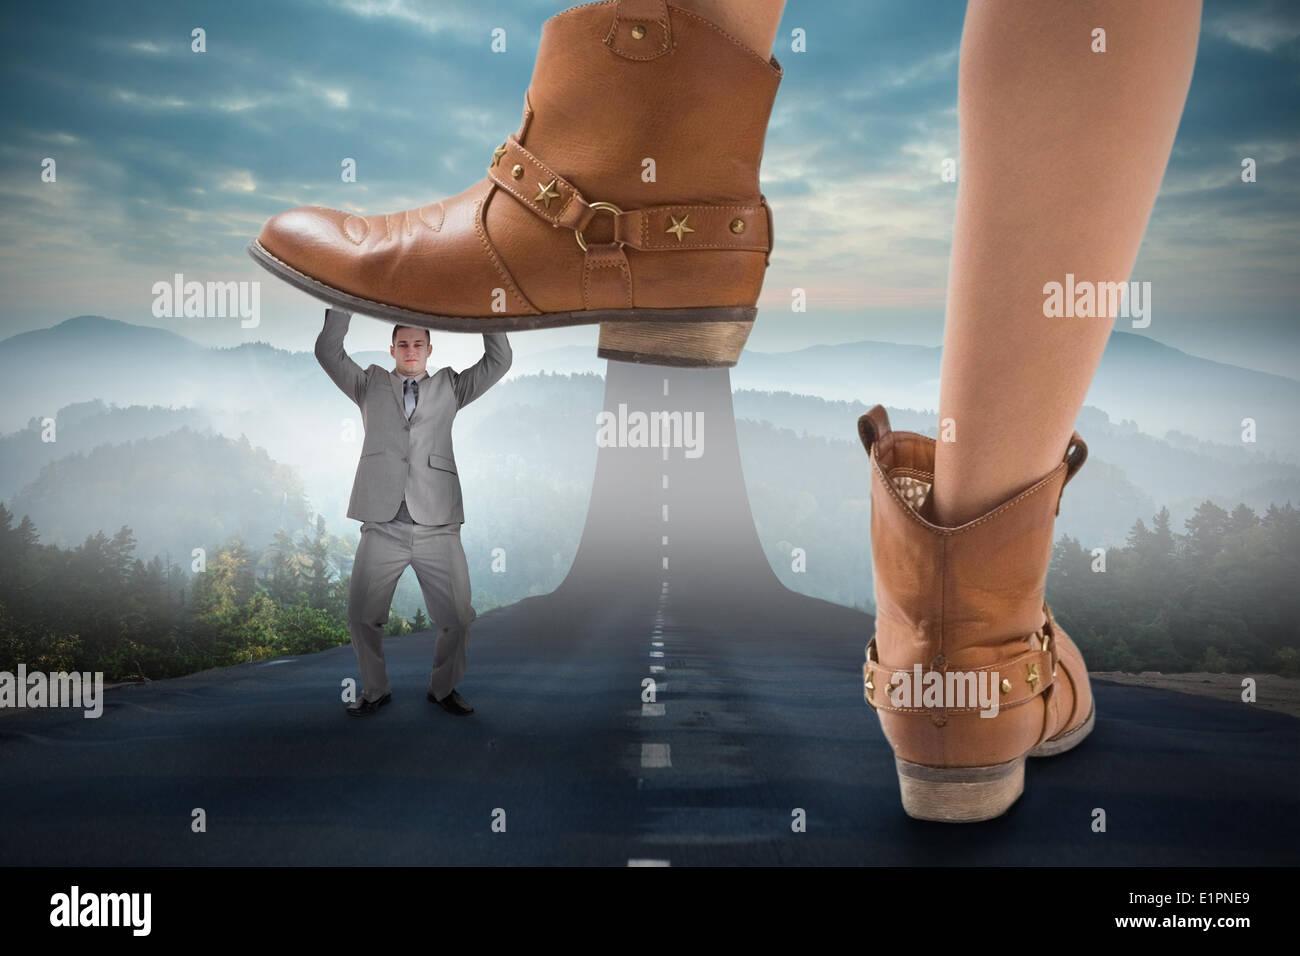 White Cowboy Boots Stock Photos Amp White Cowboy Boots Stock